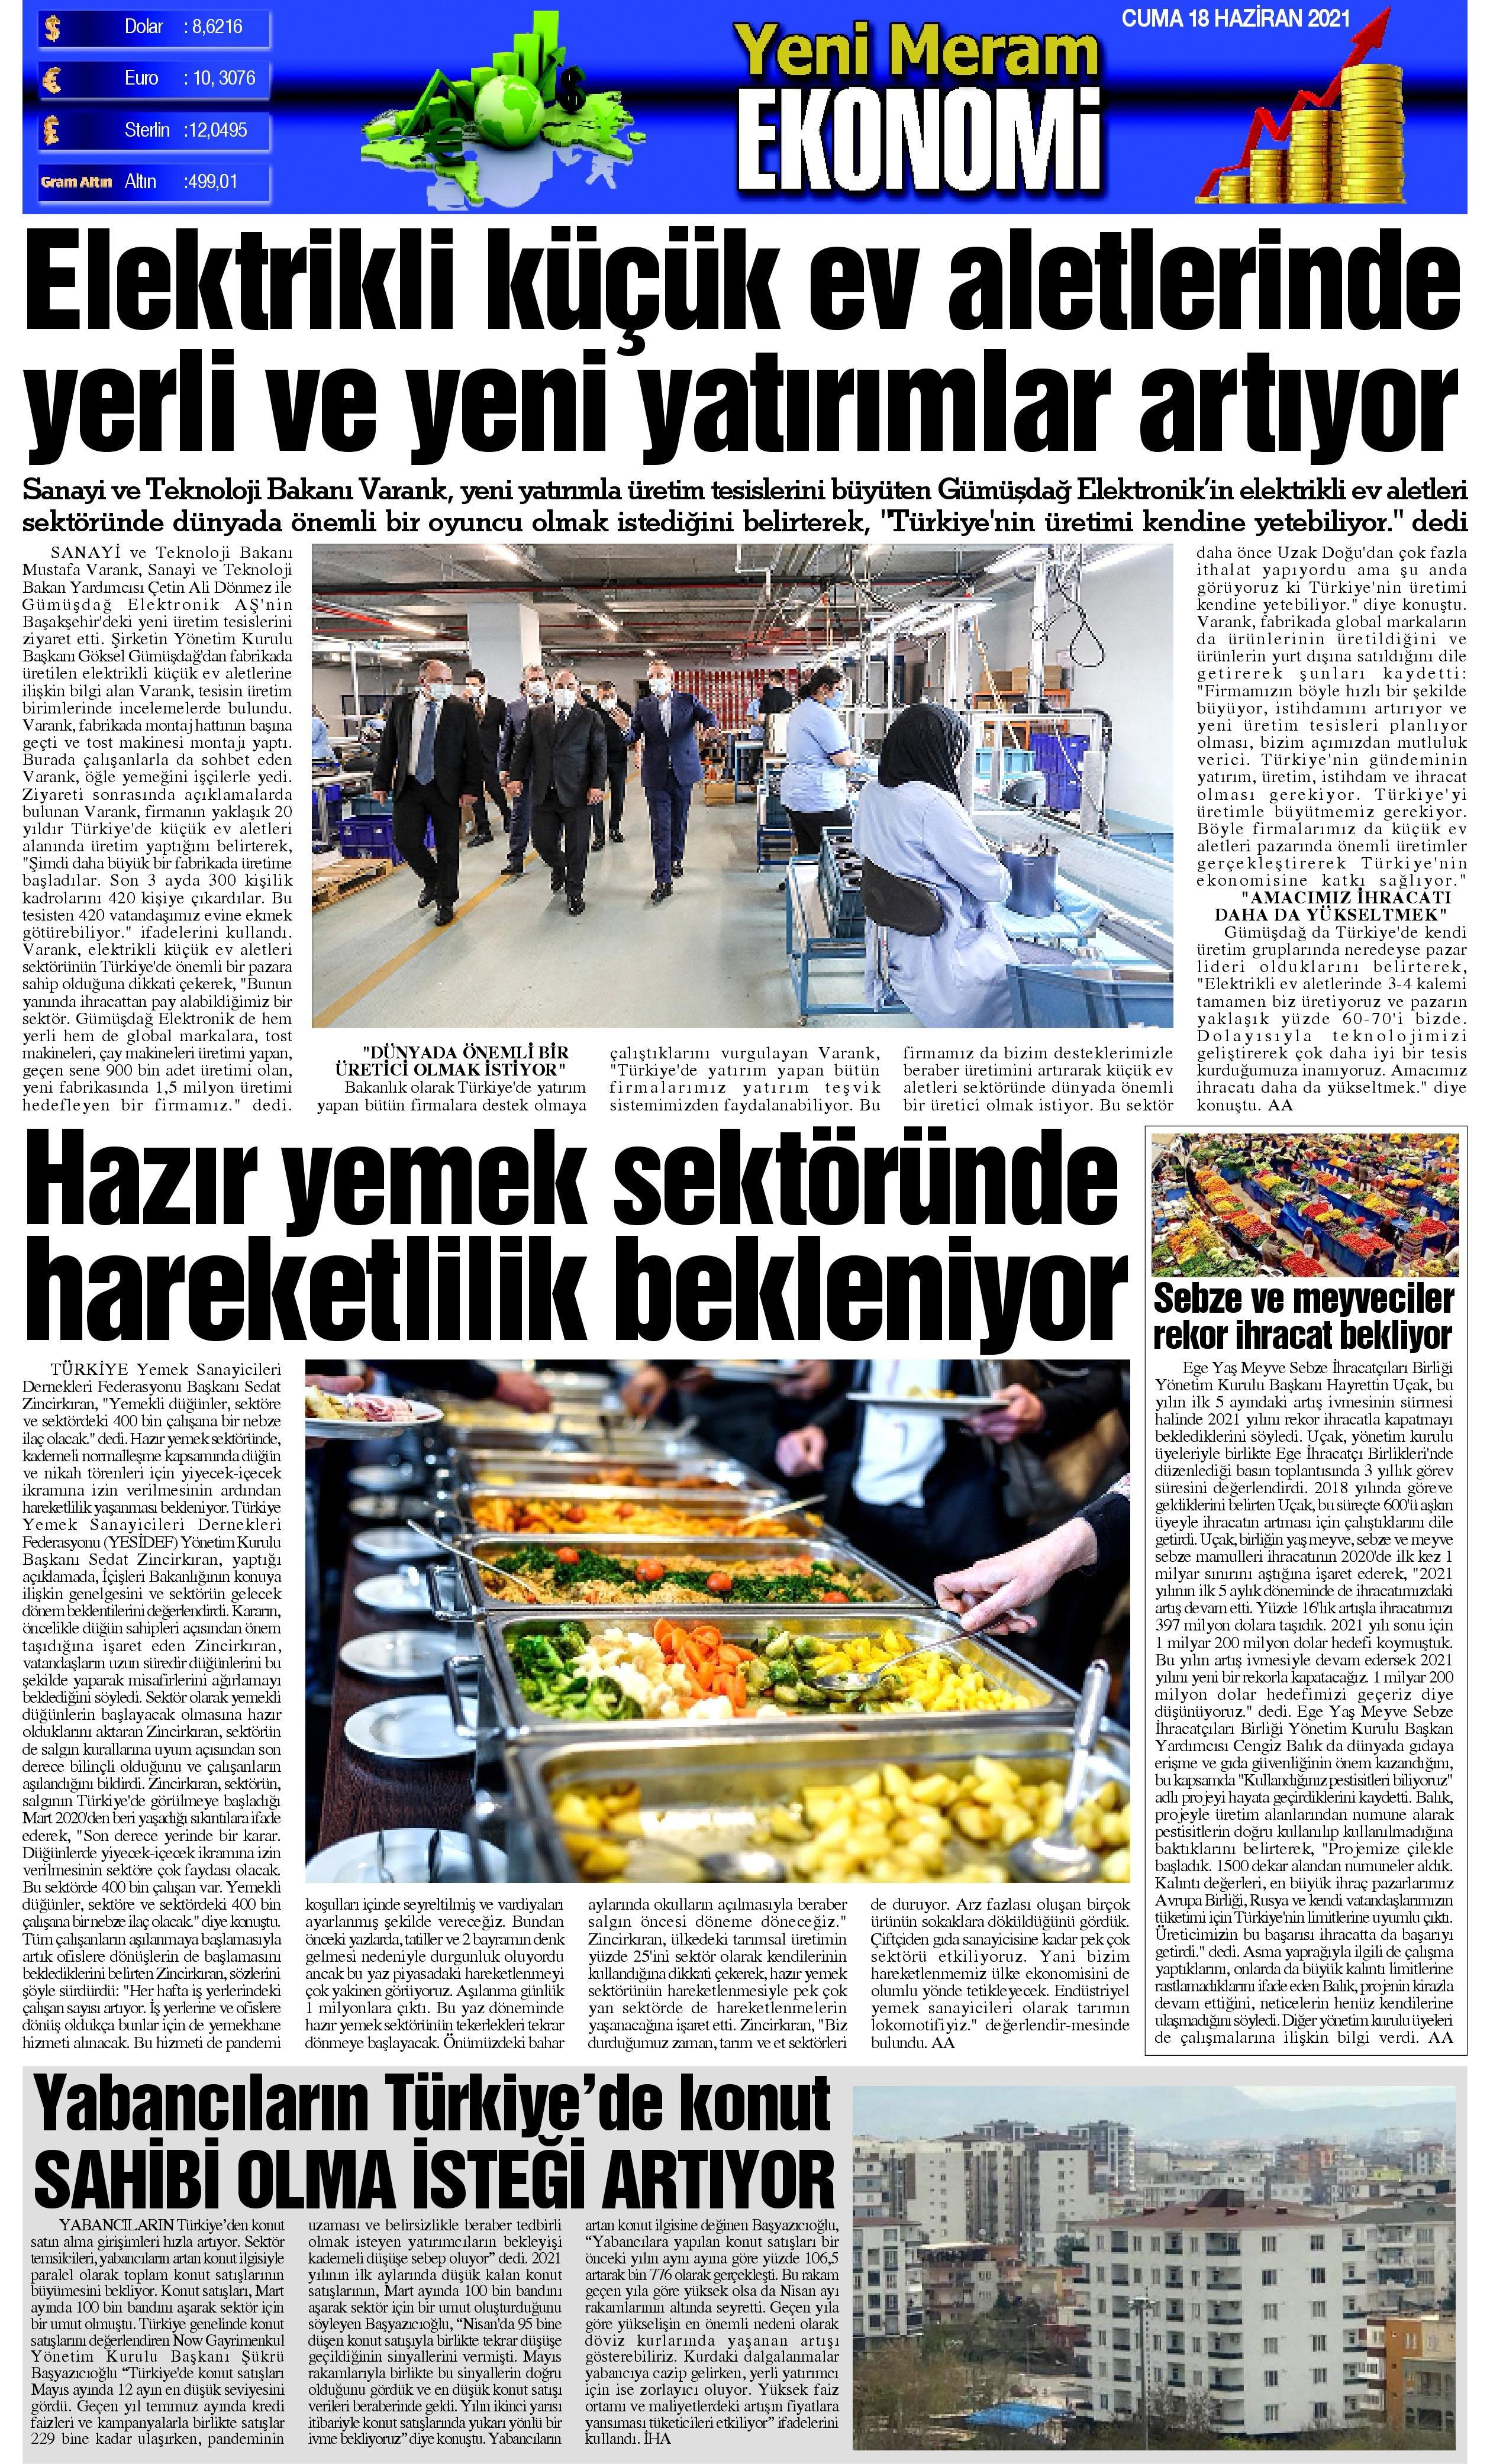 18 Haziran 2021 Yeni Meram Gazetesi